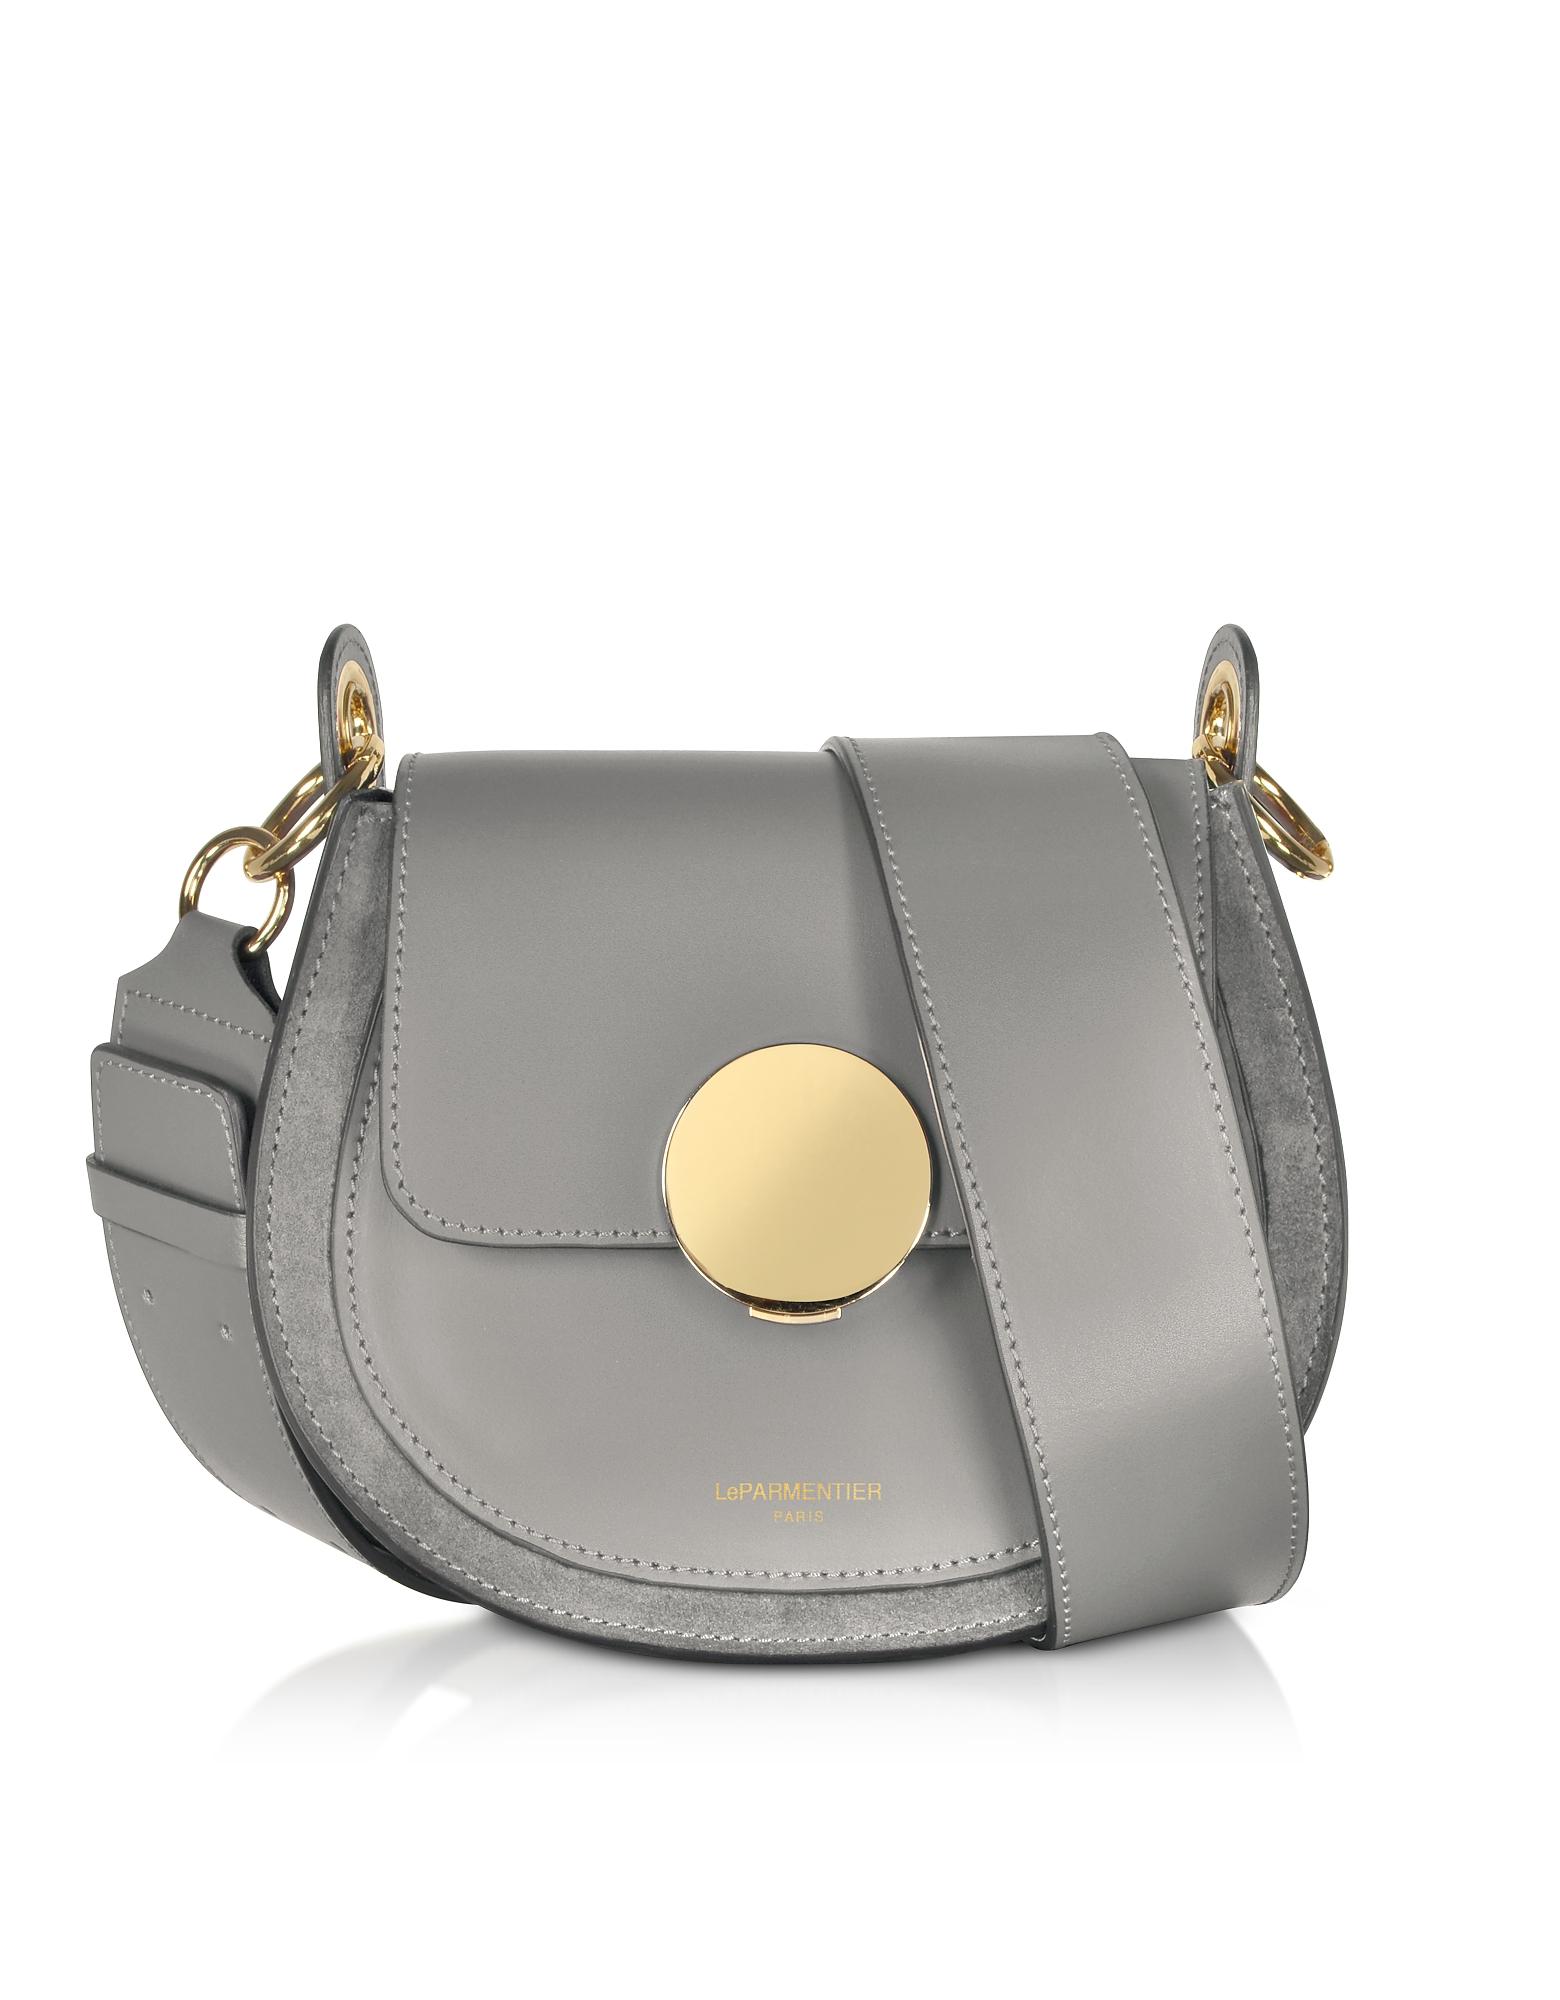 Le Parmentier Handbags, Yucca Suede and Leather Shoulder Bag